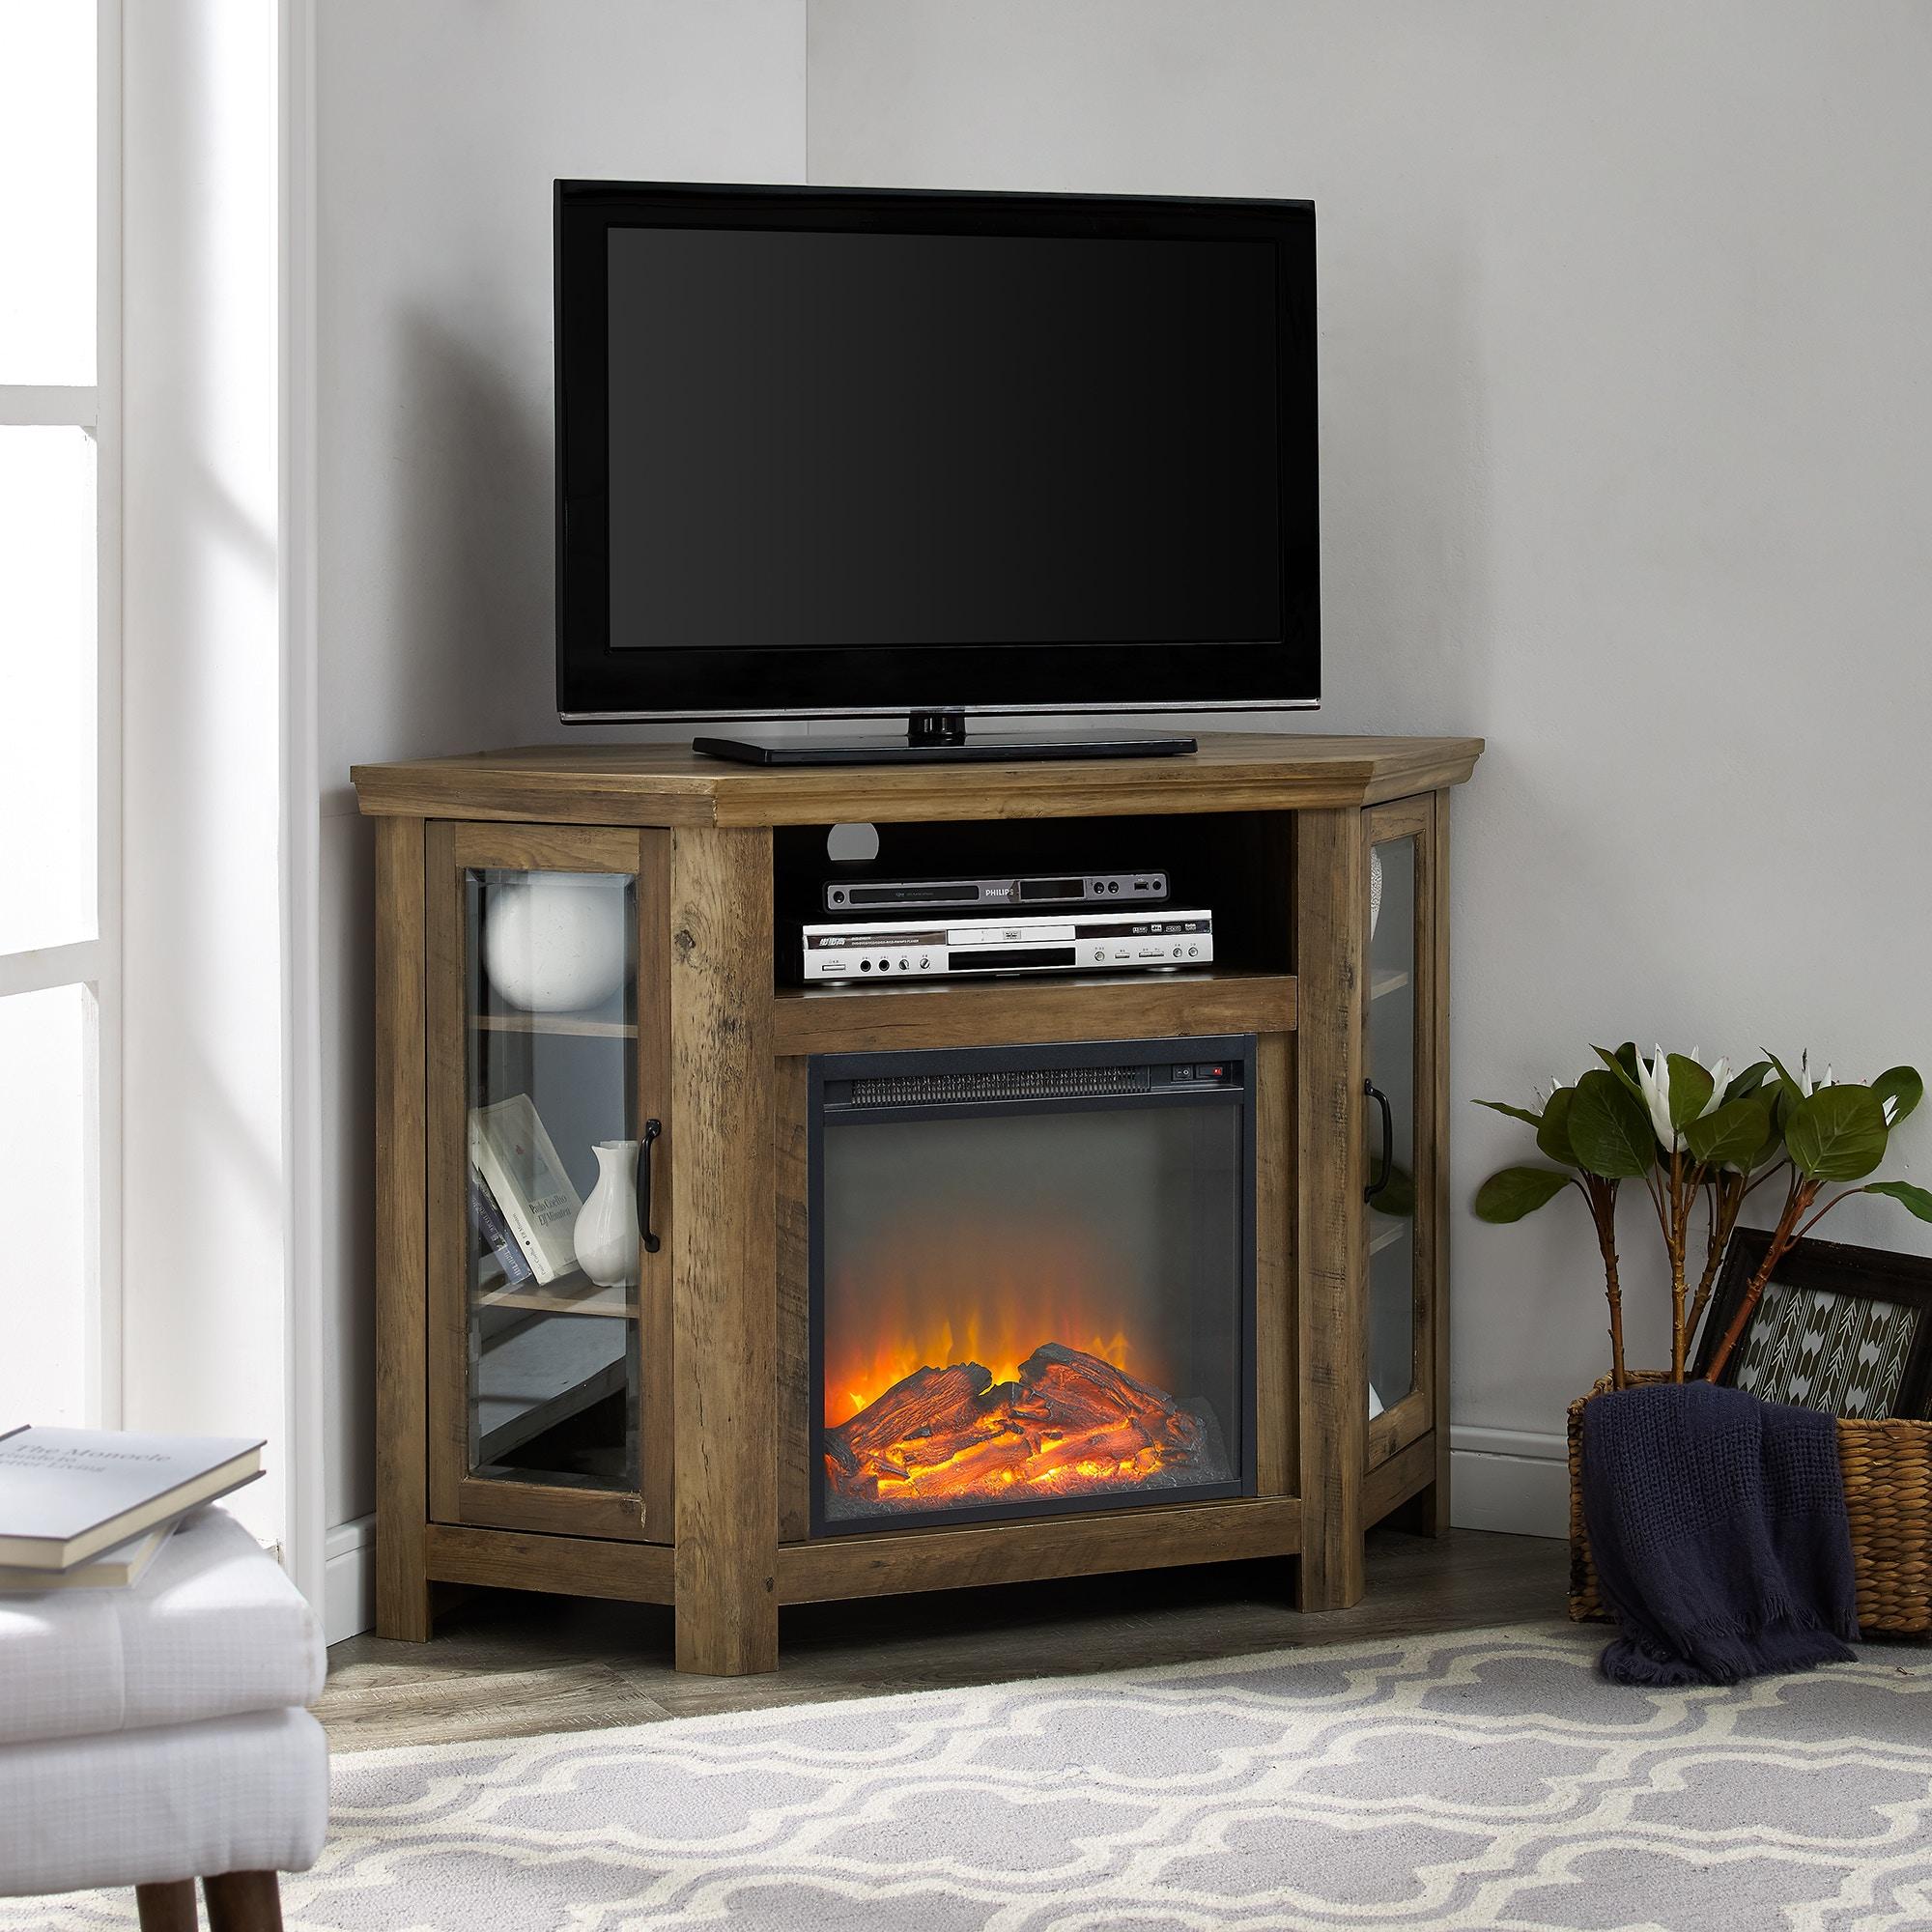 52 classic traditional wood corner fireplace media tv stand rh smithe com wood fireplace corner unit reclaimed wood corner fireplace